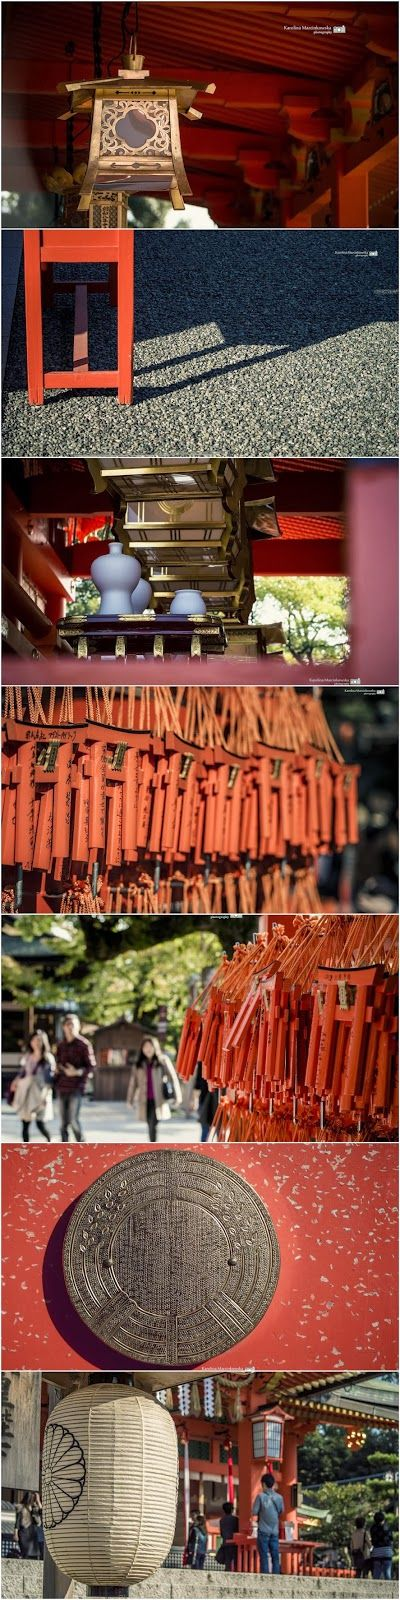 Shrine of Inari - The Details, Kyoto, Japan